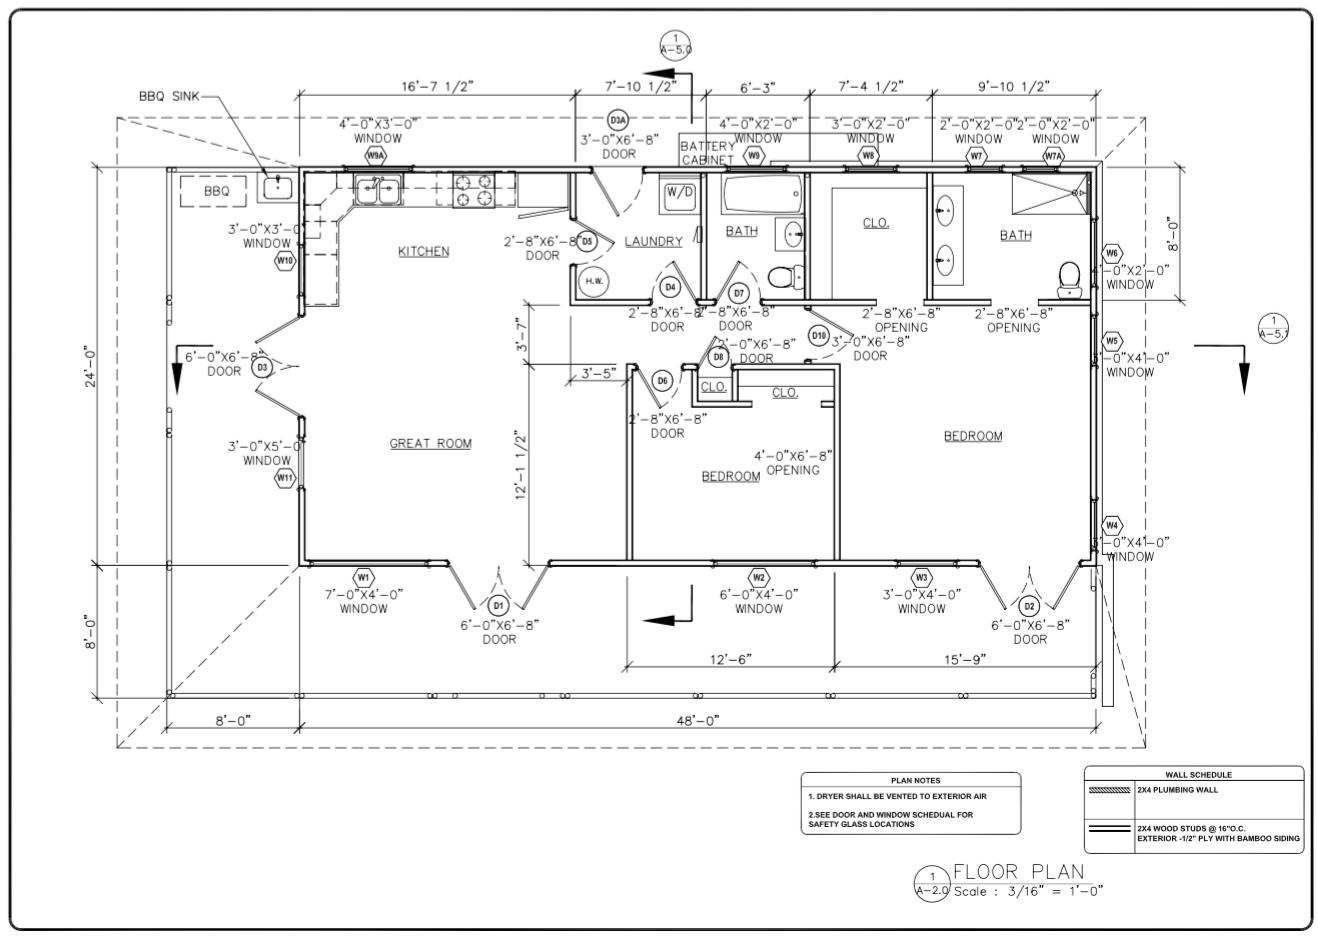 Bali 1152 - Floorplan